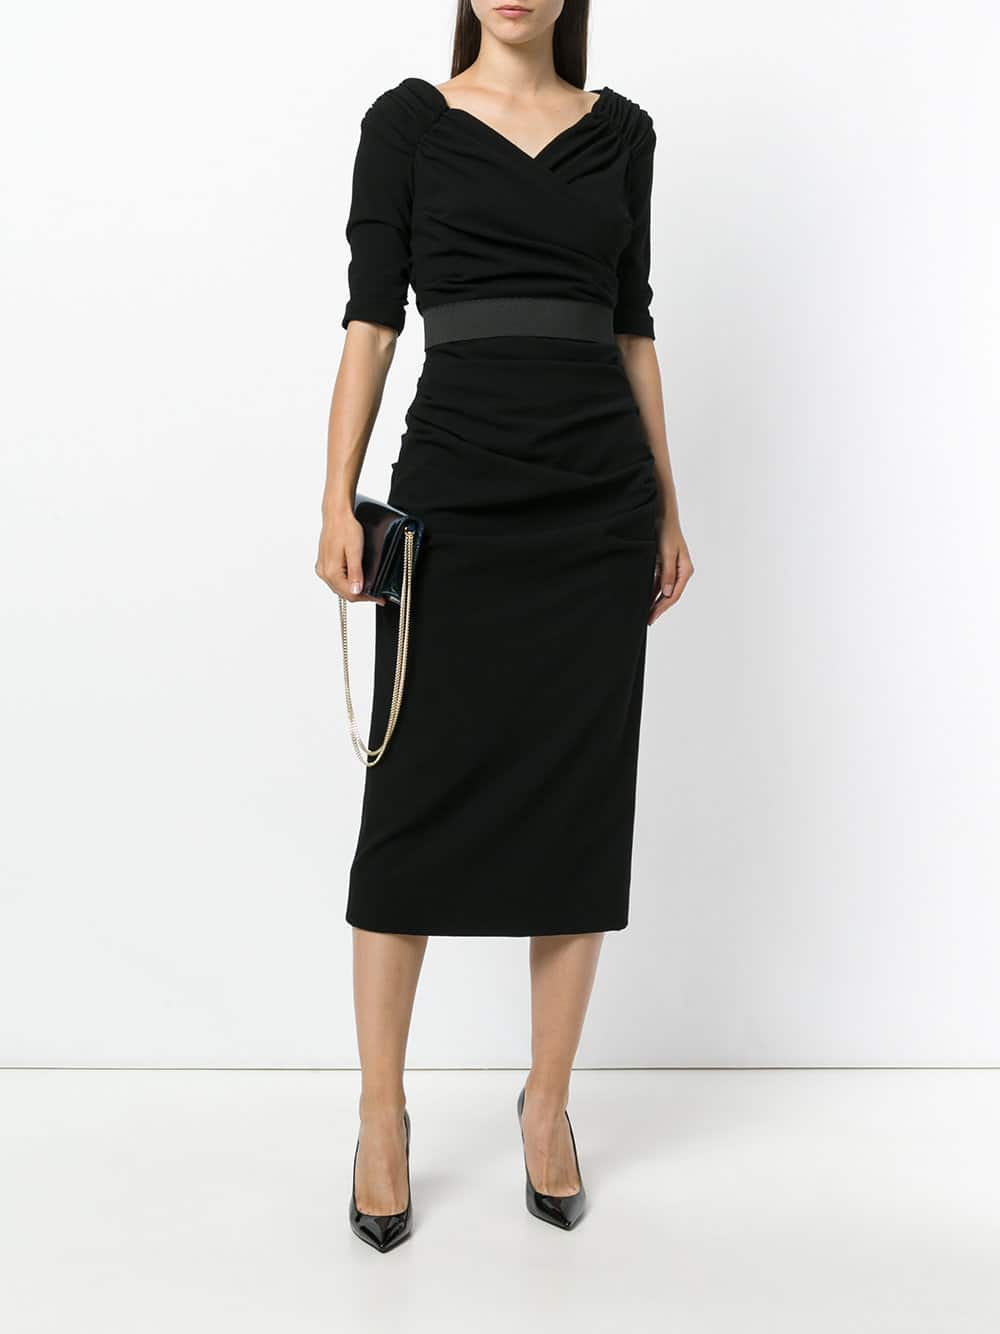 7b99102ebf2 DOLCE   GABBANA Ruched Black Dress - We Select Dresses